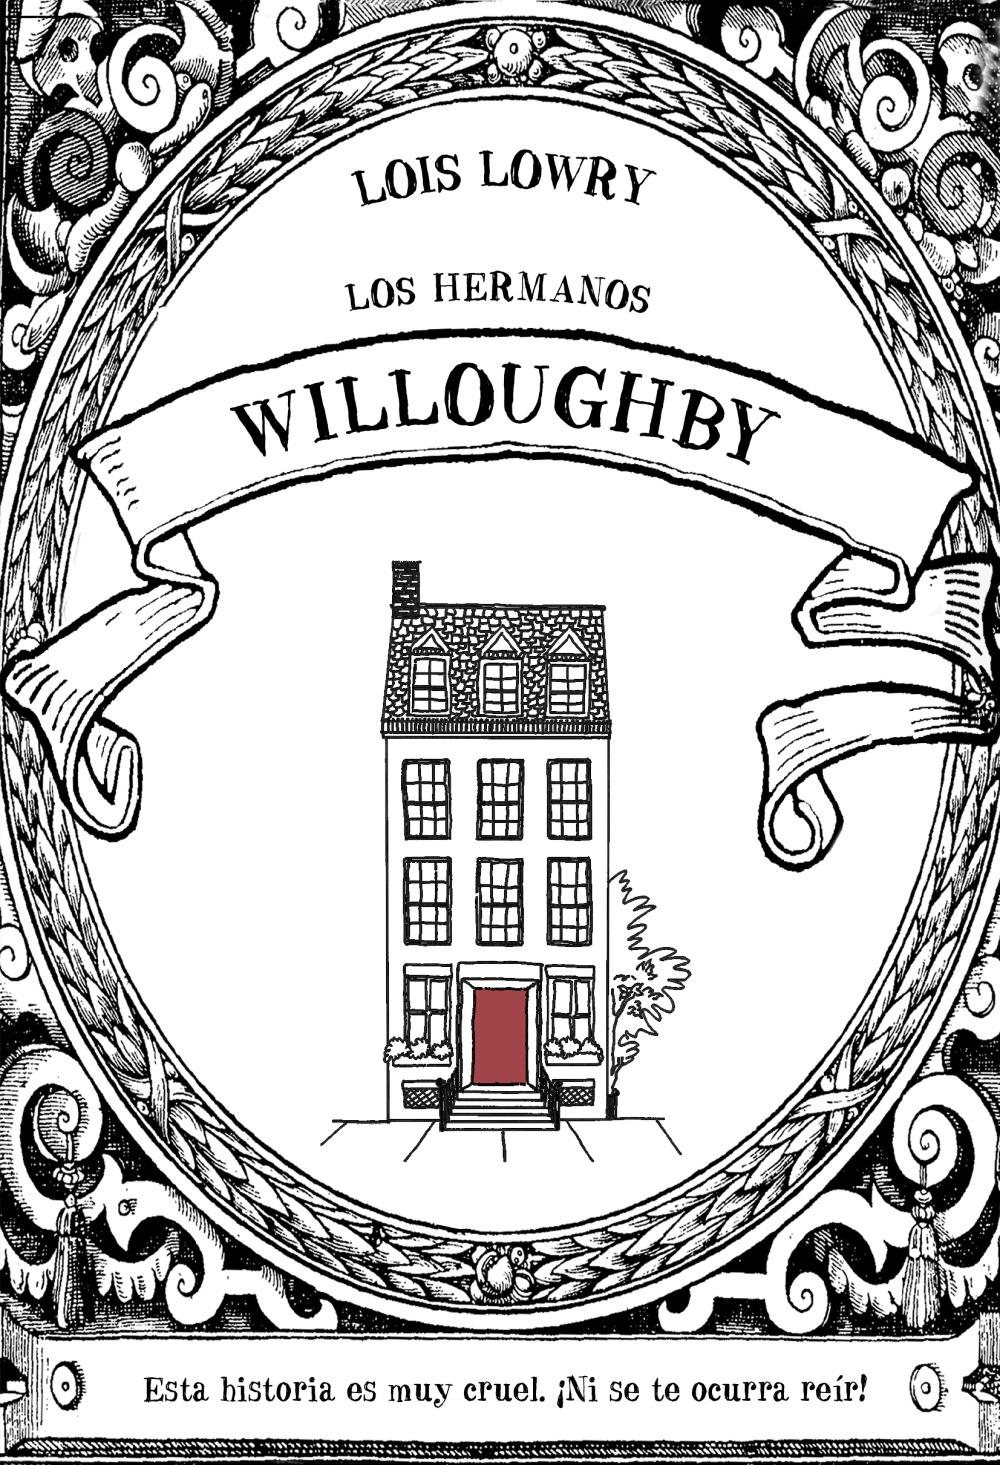 Los Los Los Los Hermanos Hermanos Los Hermanos Willoughbyebook Willoughbyebook Hermanos Willoughbyebook Willoughbyebook oWrdBexCQ